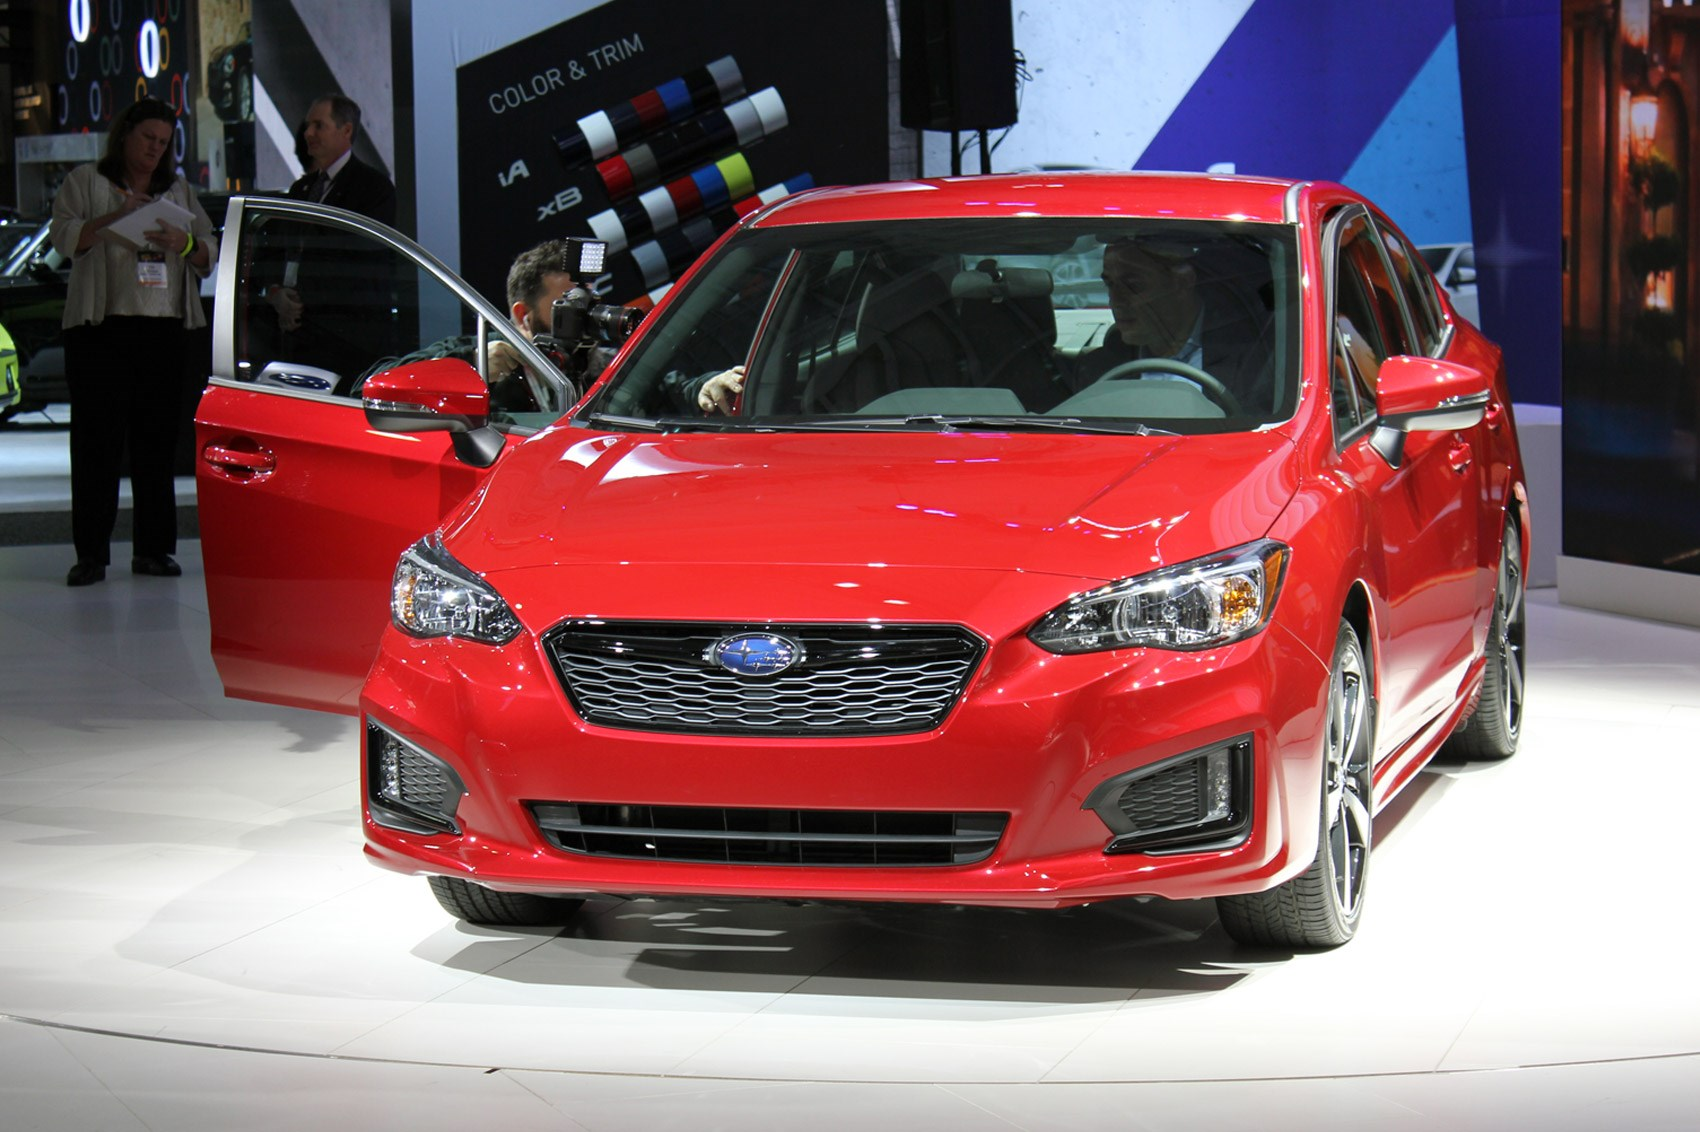 All New Subaru Impreza Wrx And Wrx Sti Versions In The Works By Car Magazine